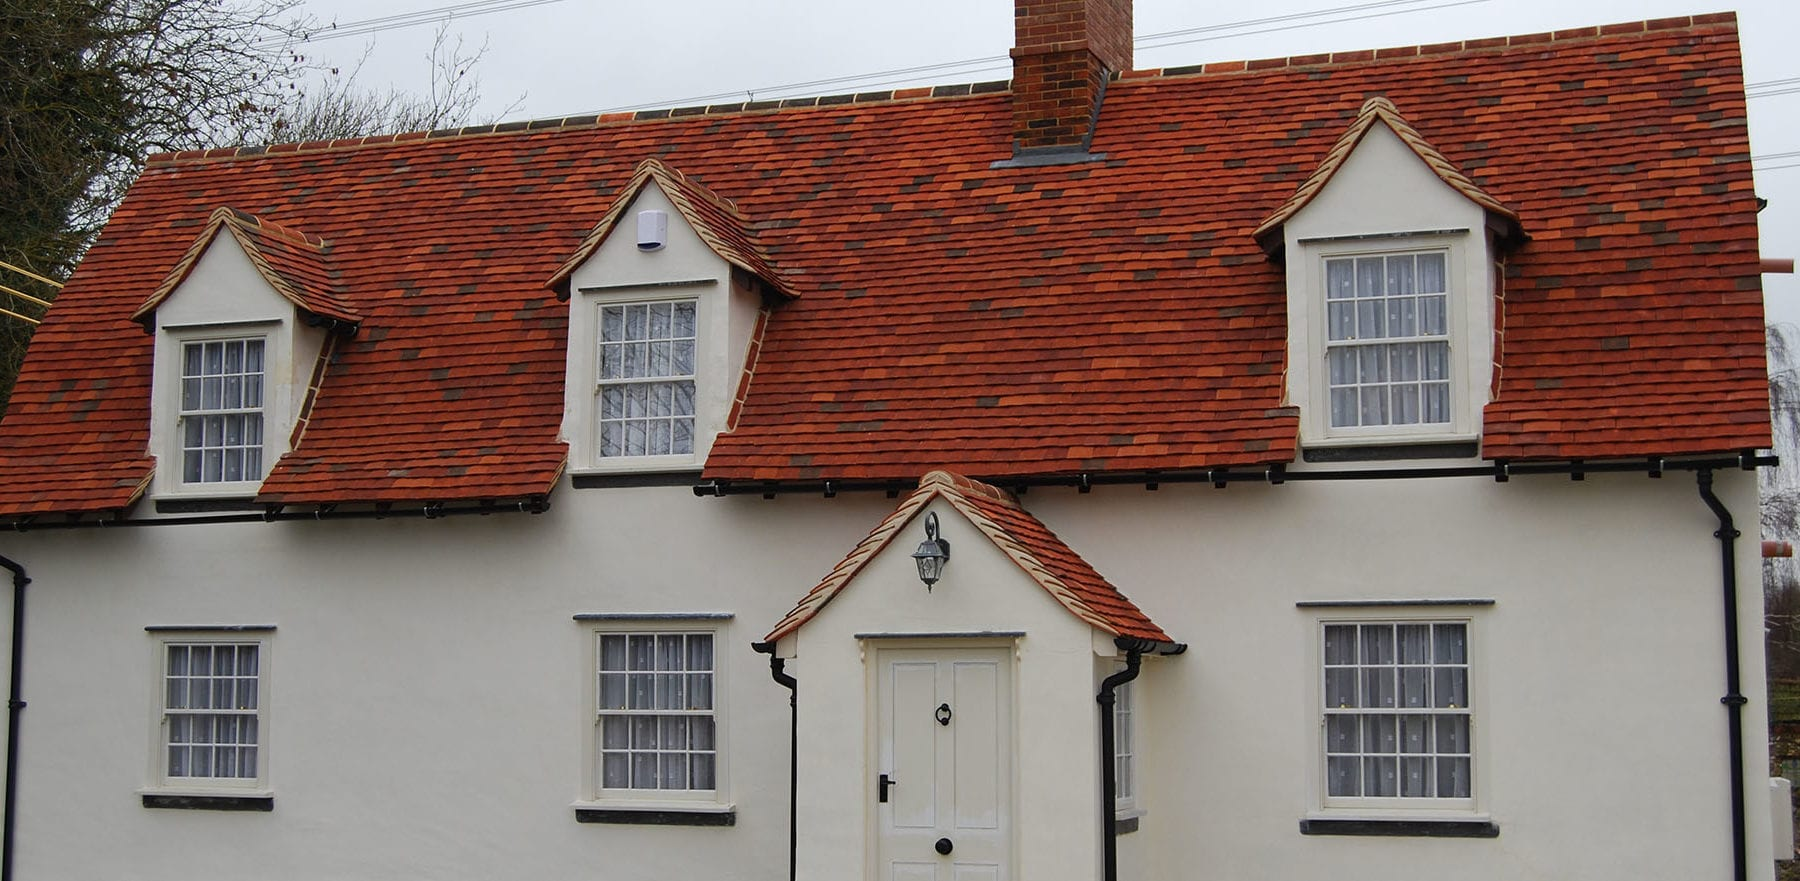 Lifestiles - Handmade Multi Clay Roof Tiles - Gainsford End, England 6